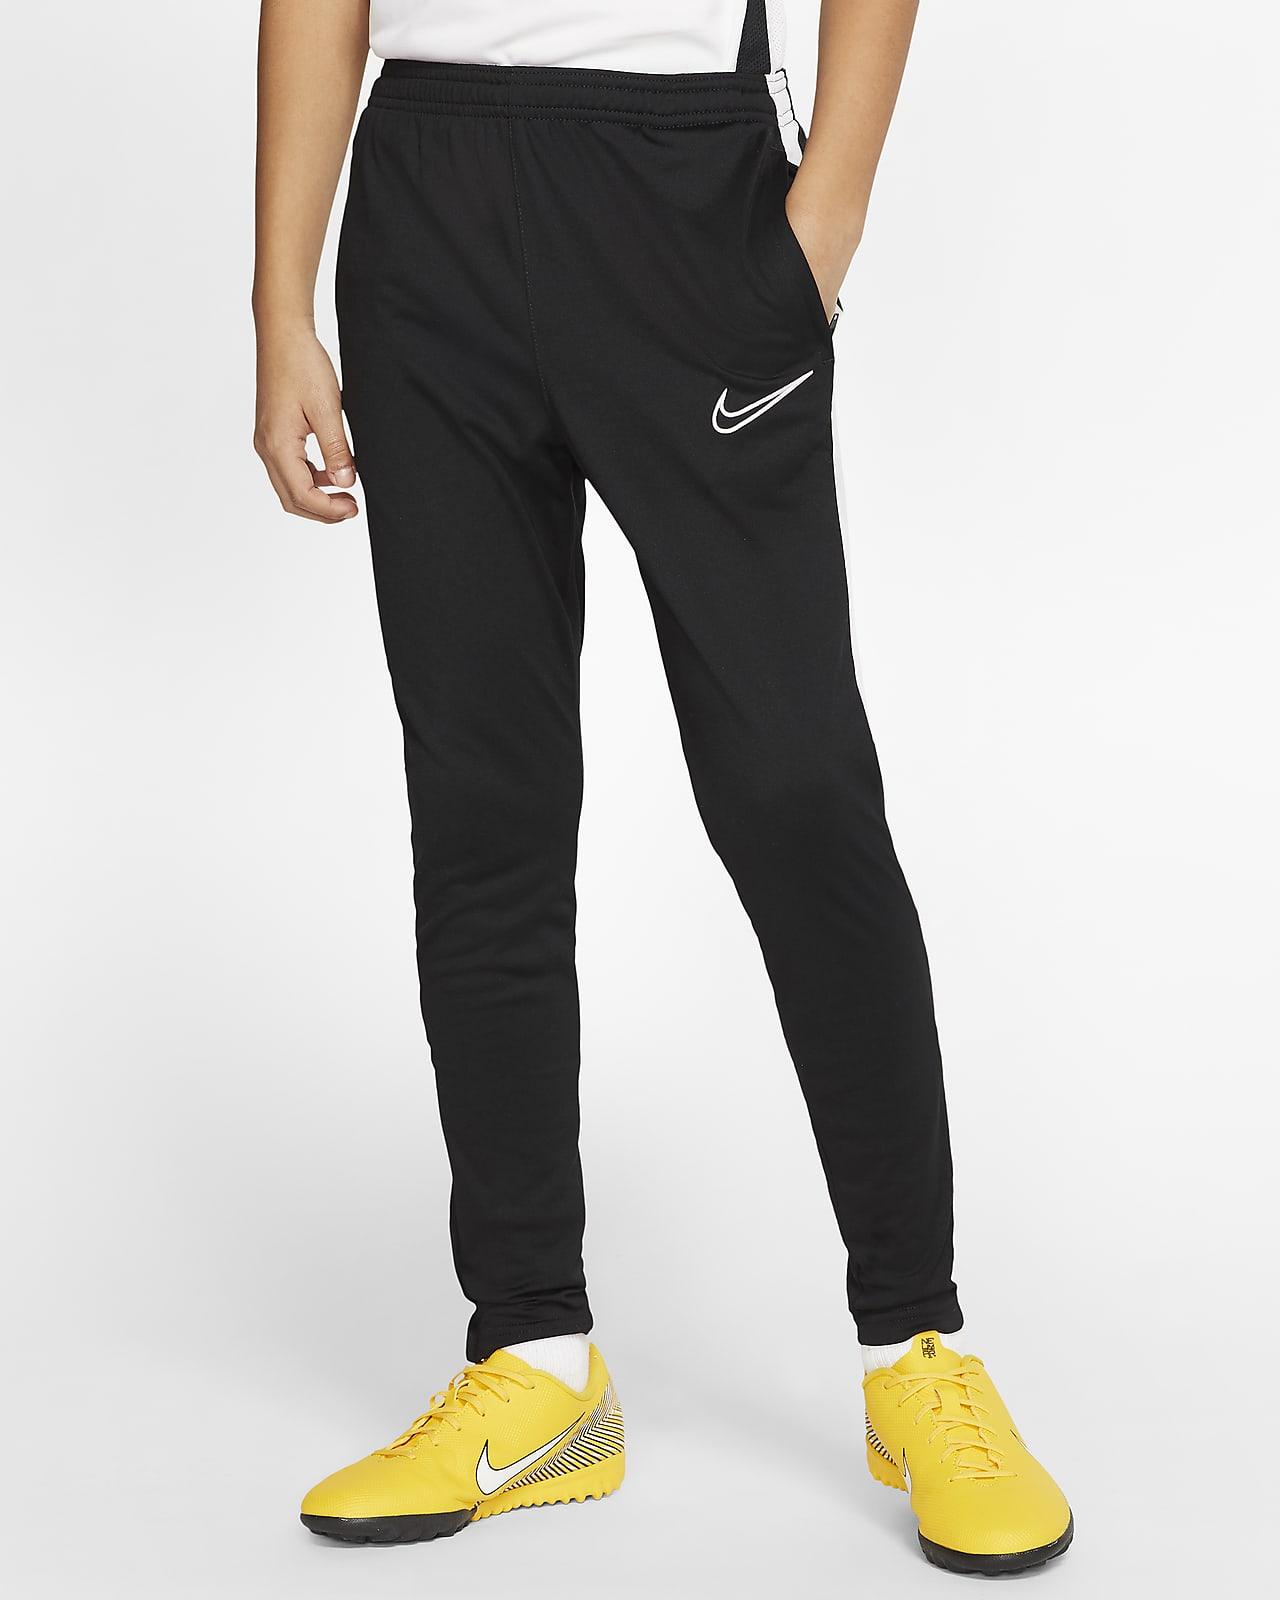 Pantalones De Futbol Para Ninos Talla Grande Nike Dri Fit Academy Nike Com